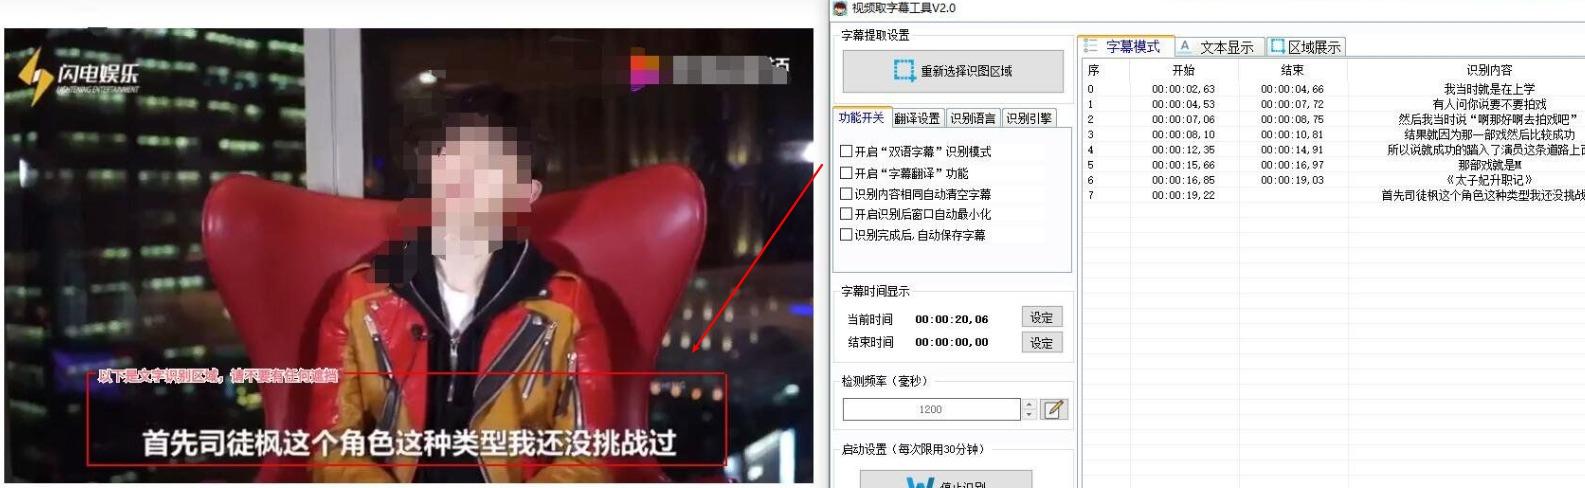 PC视频取字幕单板工具v2.0 支持在线翻译功能